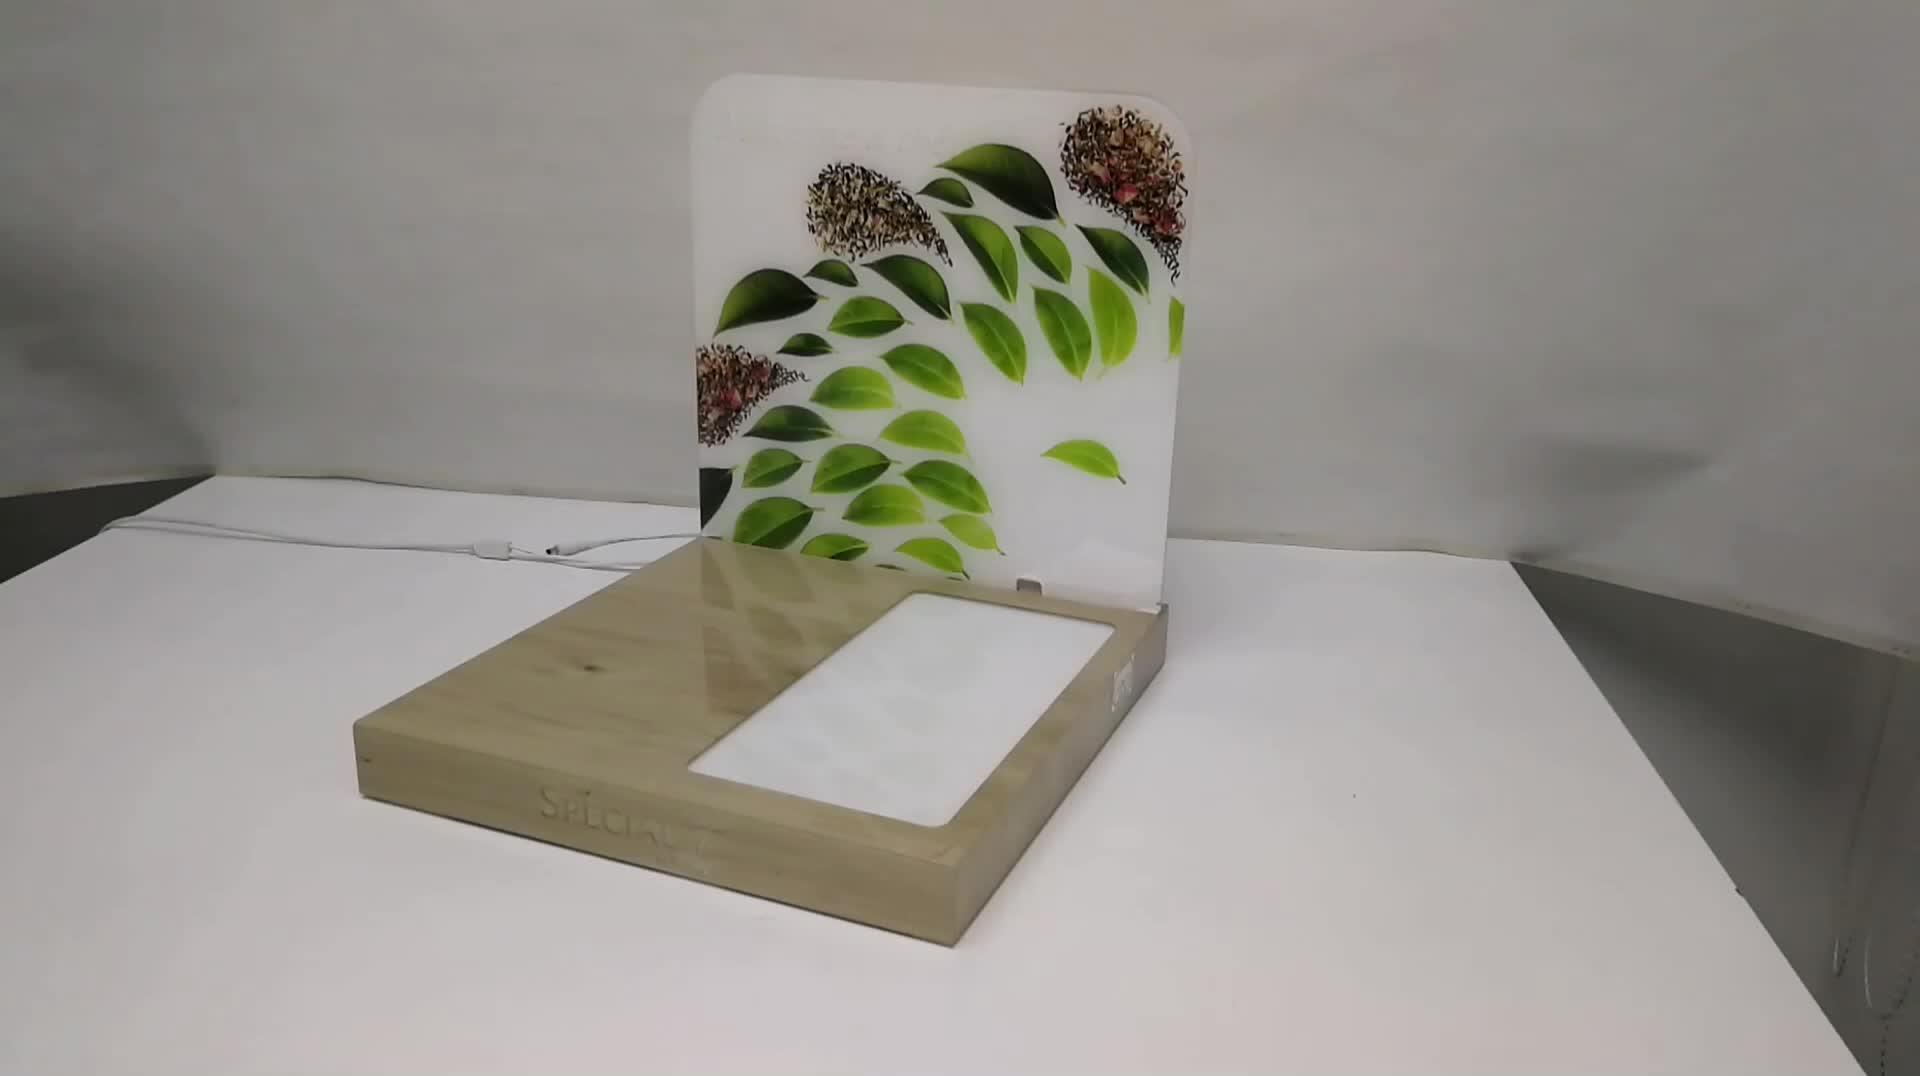 Custom Verlichte Acryl Teller Display Stand met LED Verlichting voor Koffie Machine Acryl L display Rack